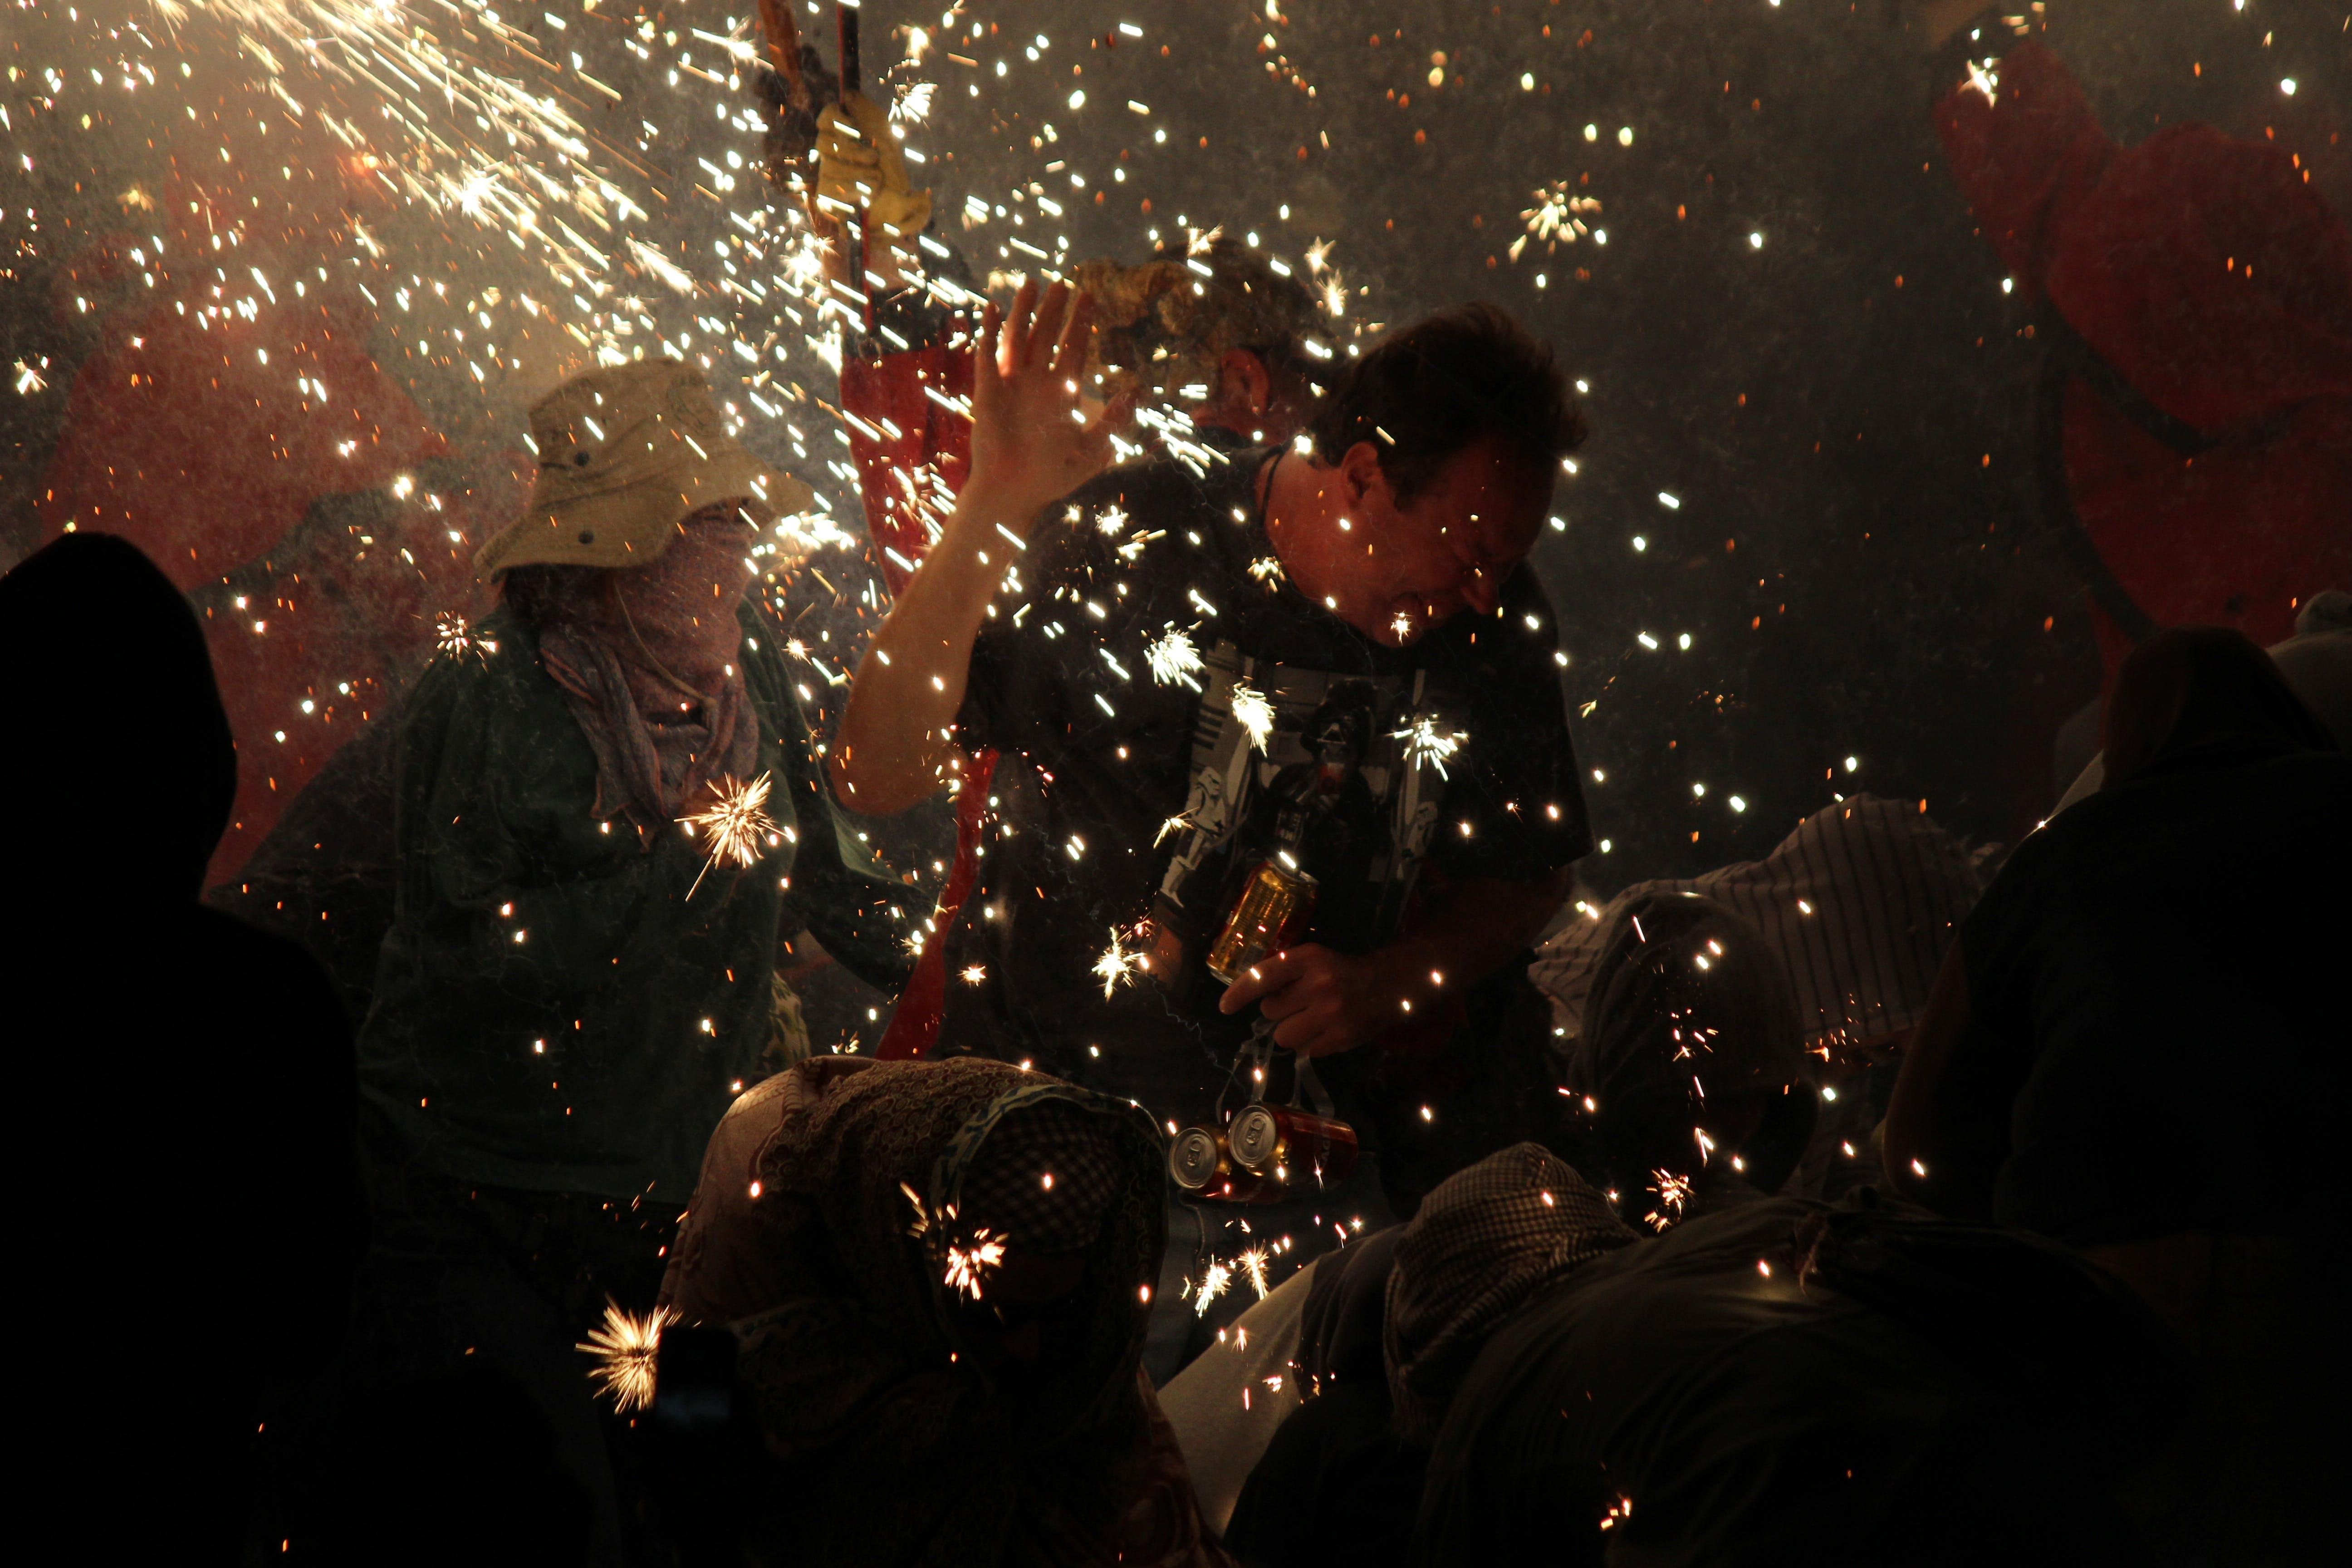 Free stock photo of celebration, crowd, festival, fireworks